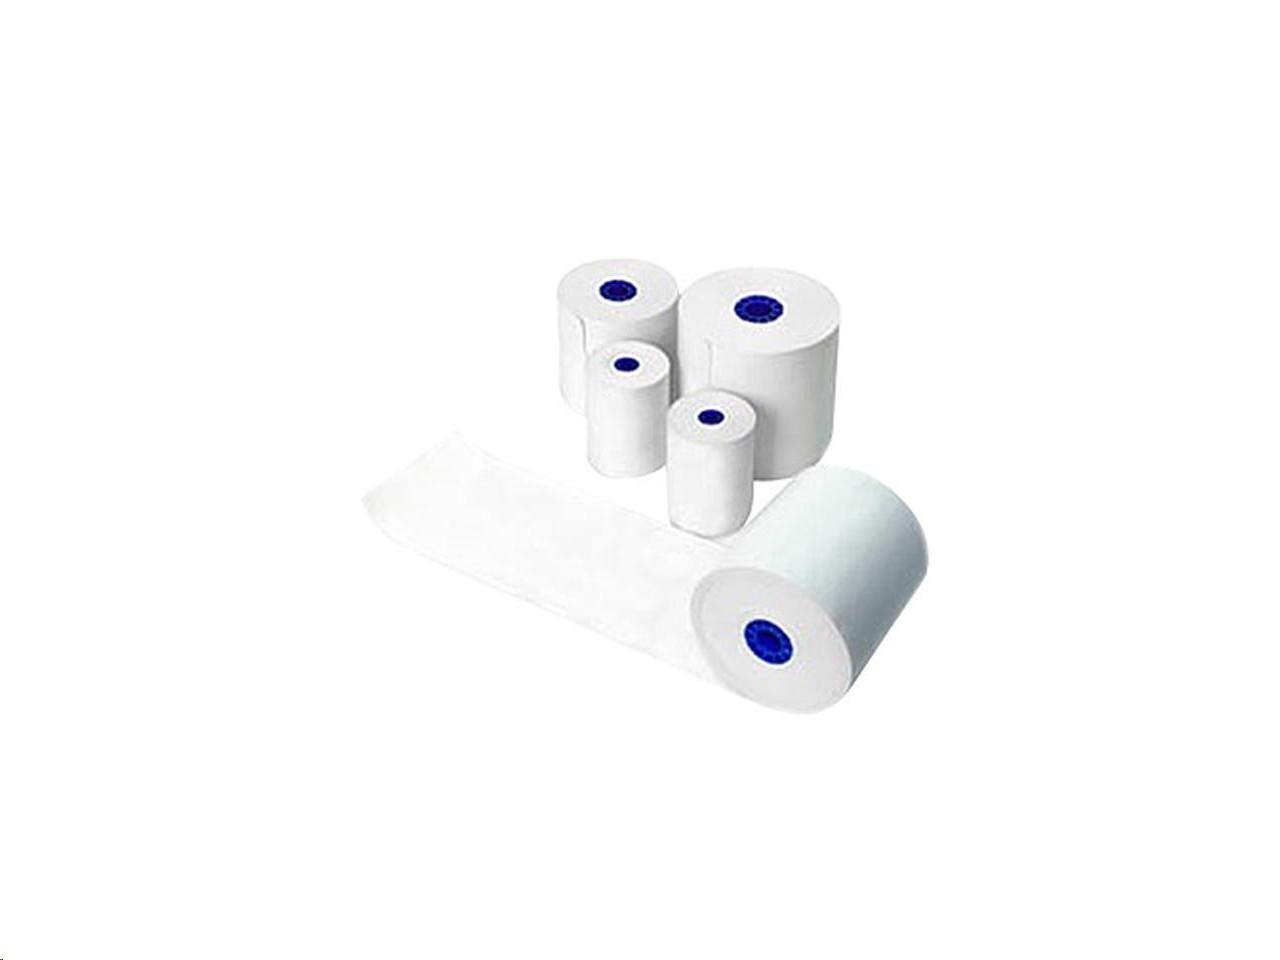 Star Micronics 3x2 Receipt Paper 900 Labels Per Roll Pack Of 12 37967480